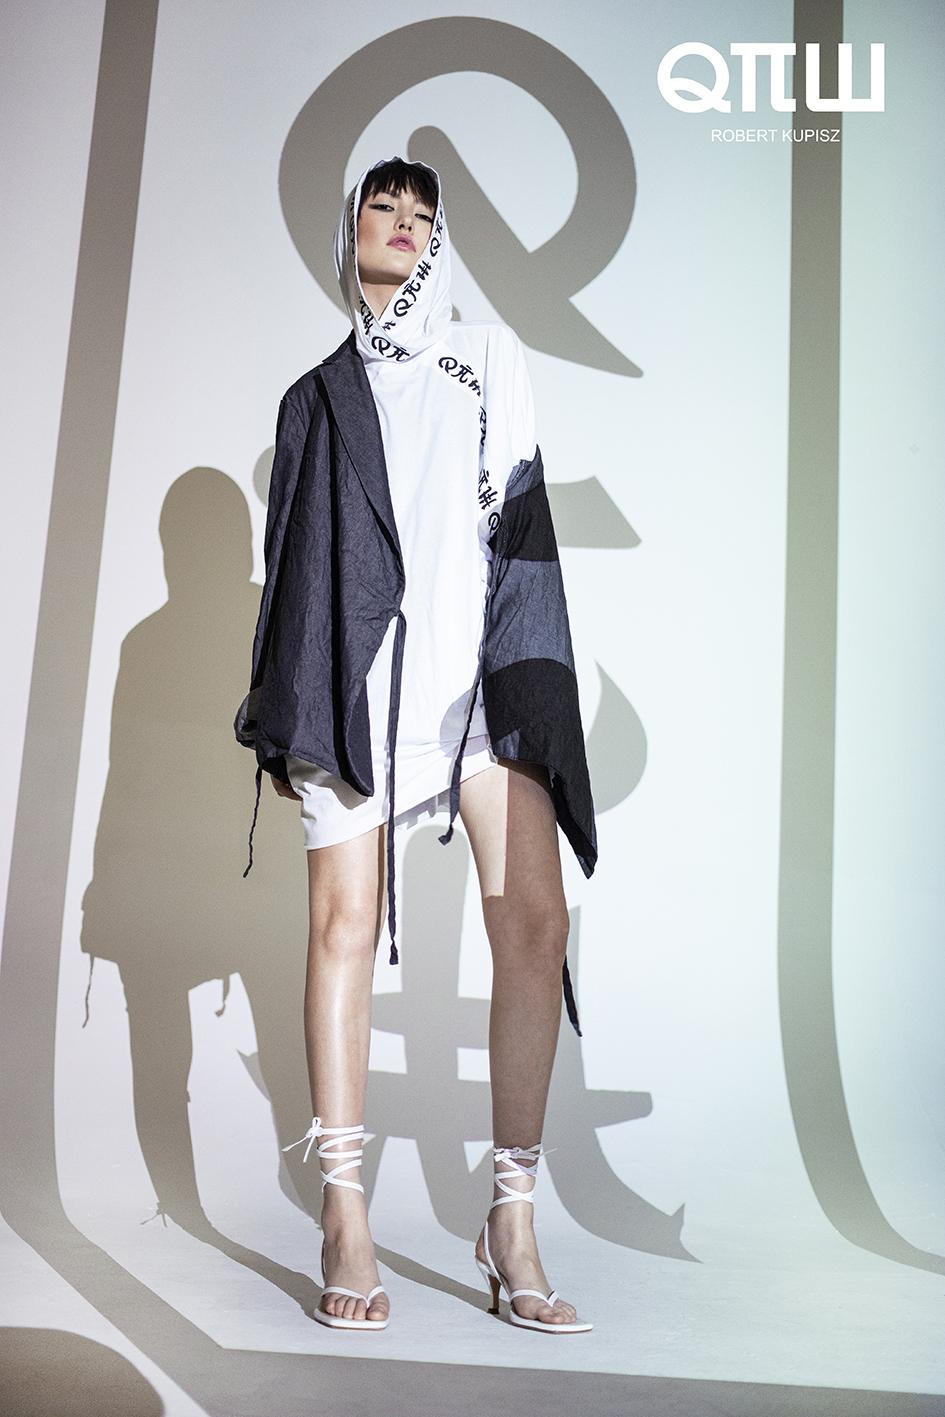 Moda Damska Moda Męska  ORIENT SS21 by Qπш Robert Kupisz